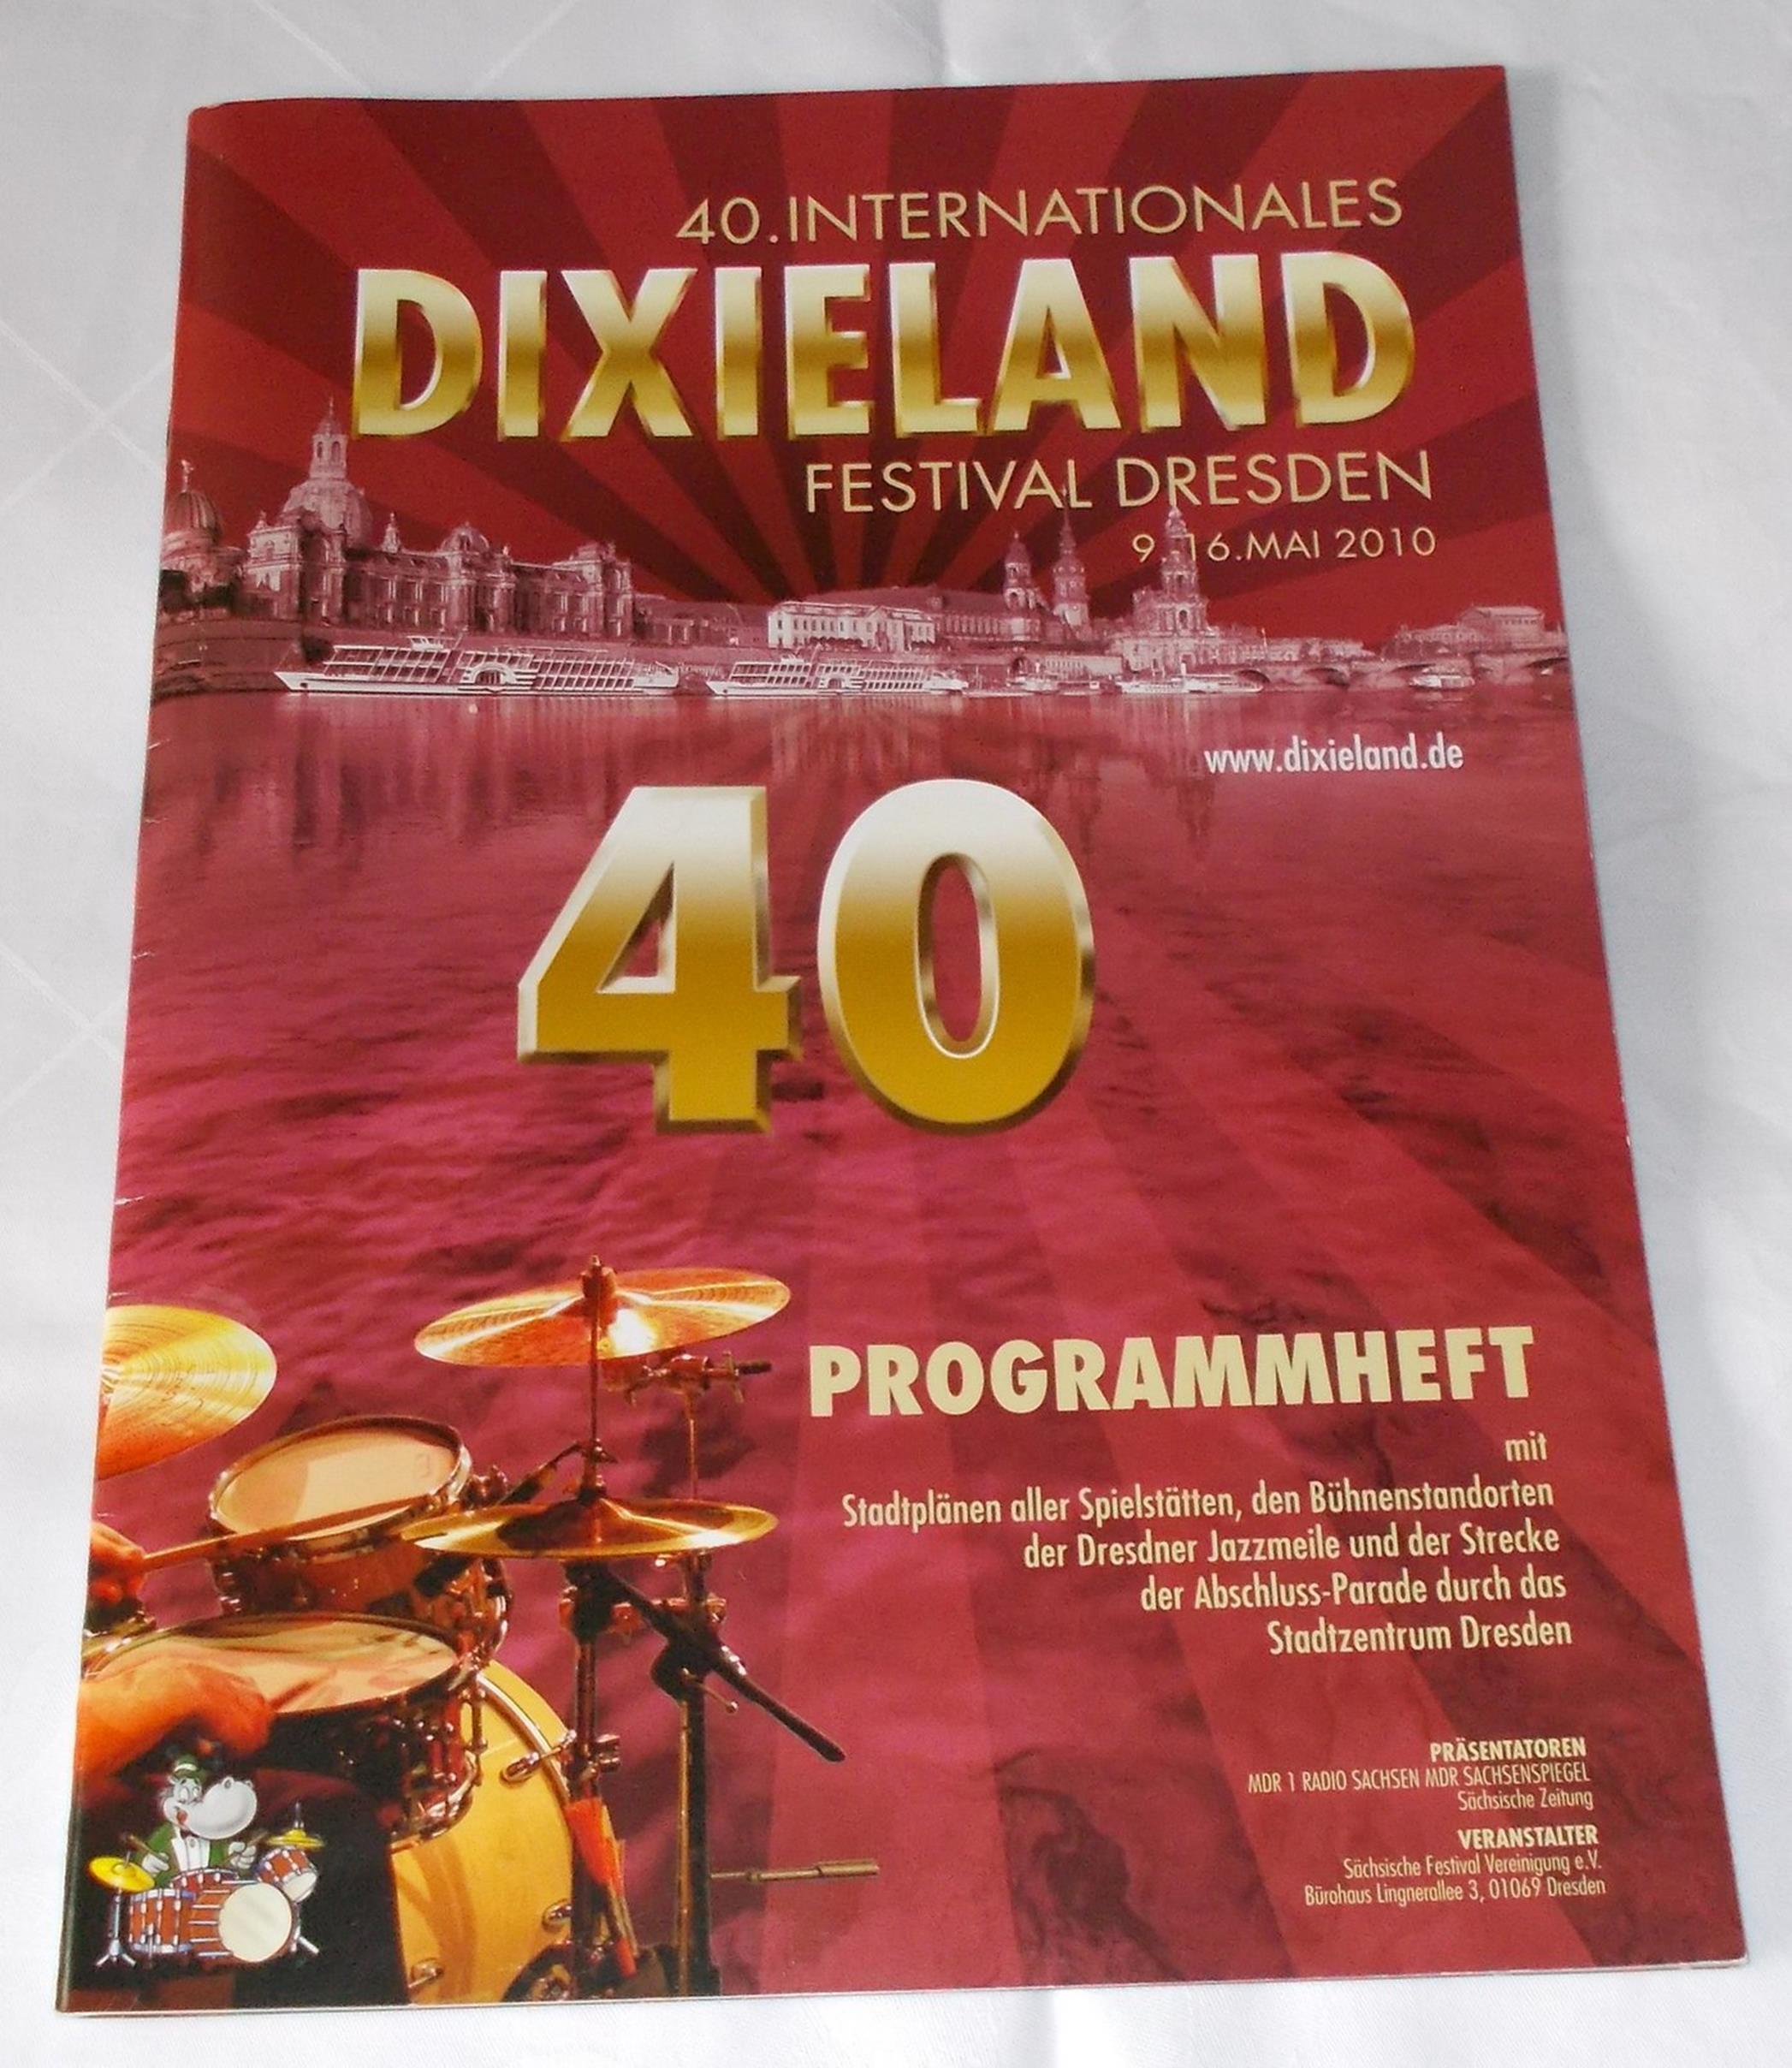 Programmheft 40. Internationales Dixieland Festival Dresden 9.-16. Mai 2010